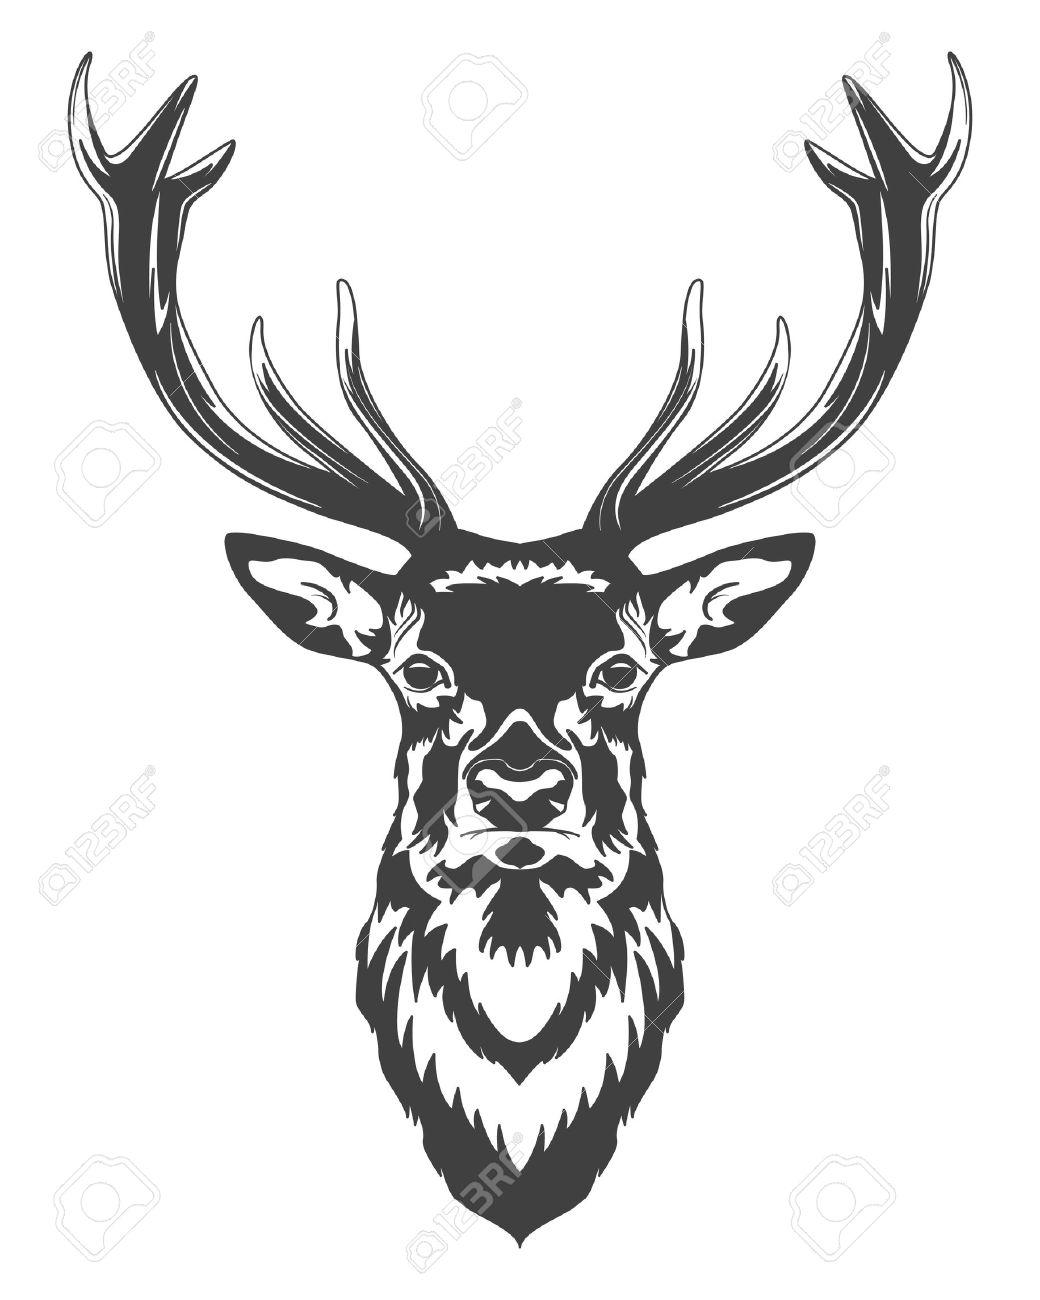 Monochrome deer head isolated on white background. Vector illustration. - 46083670